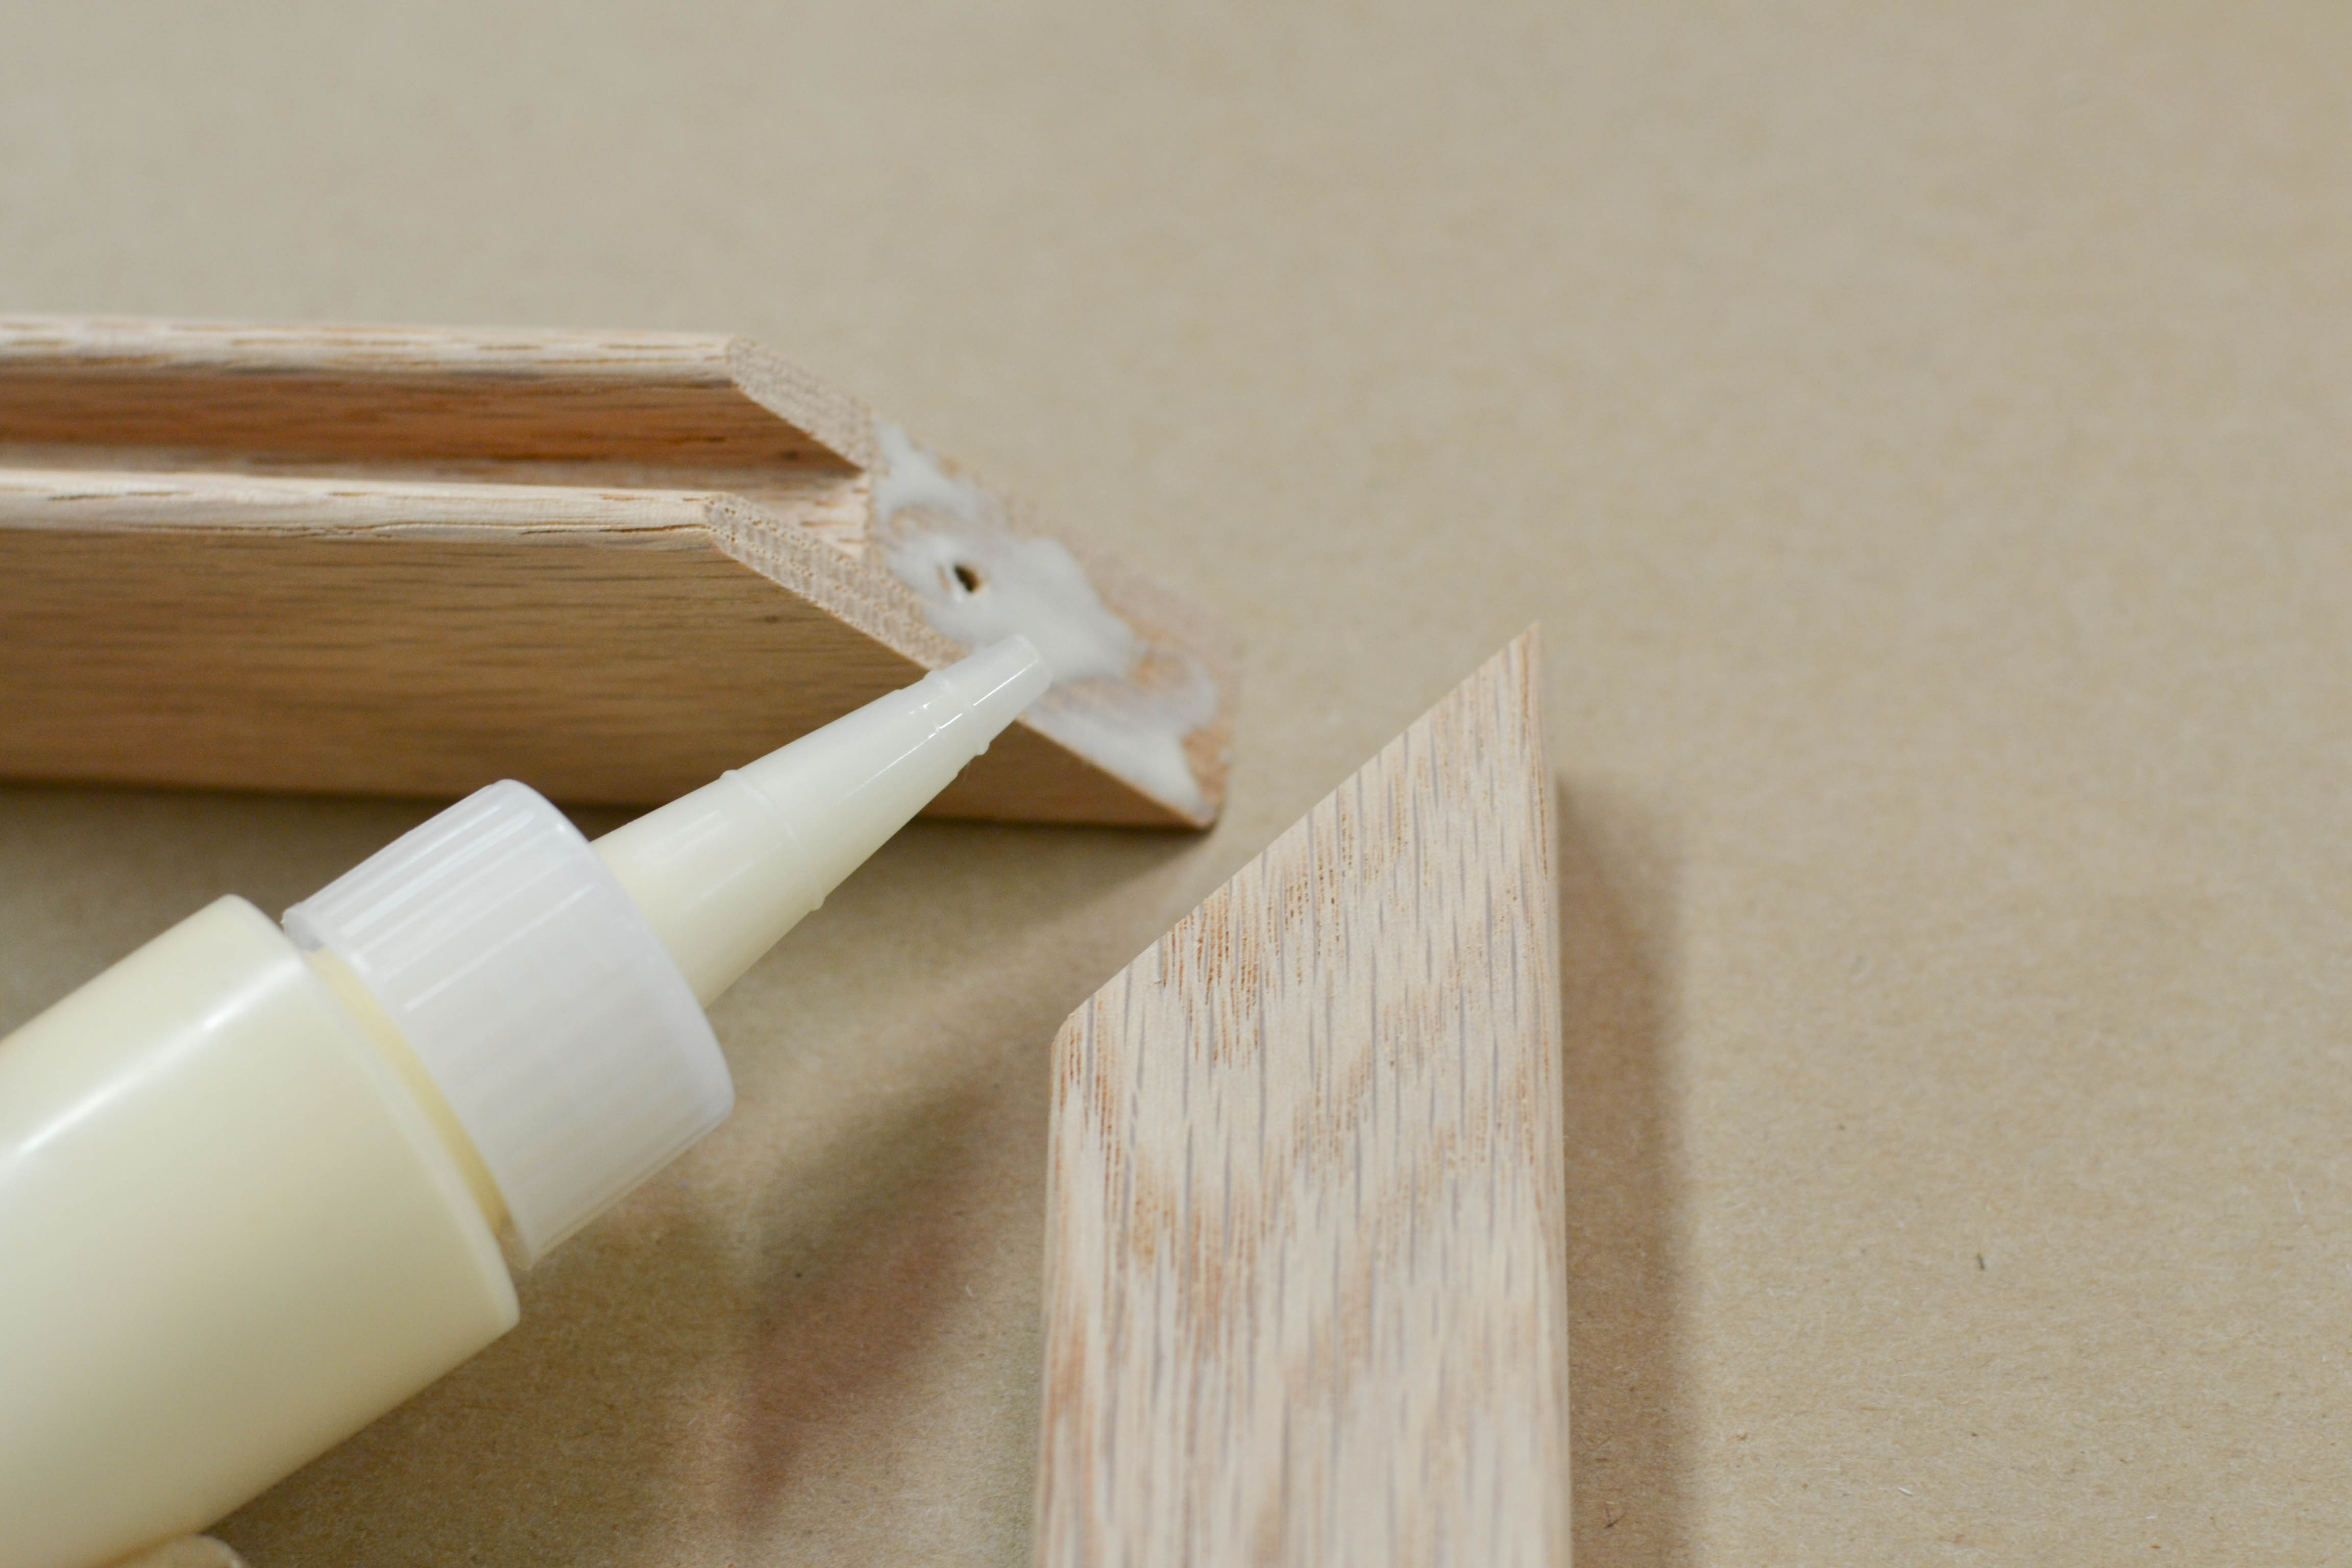 northern hardwood frames wood glue